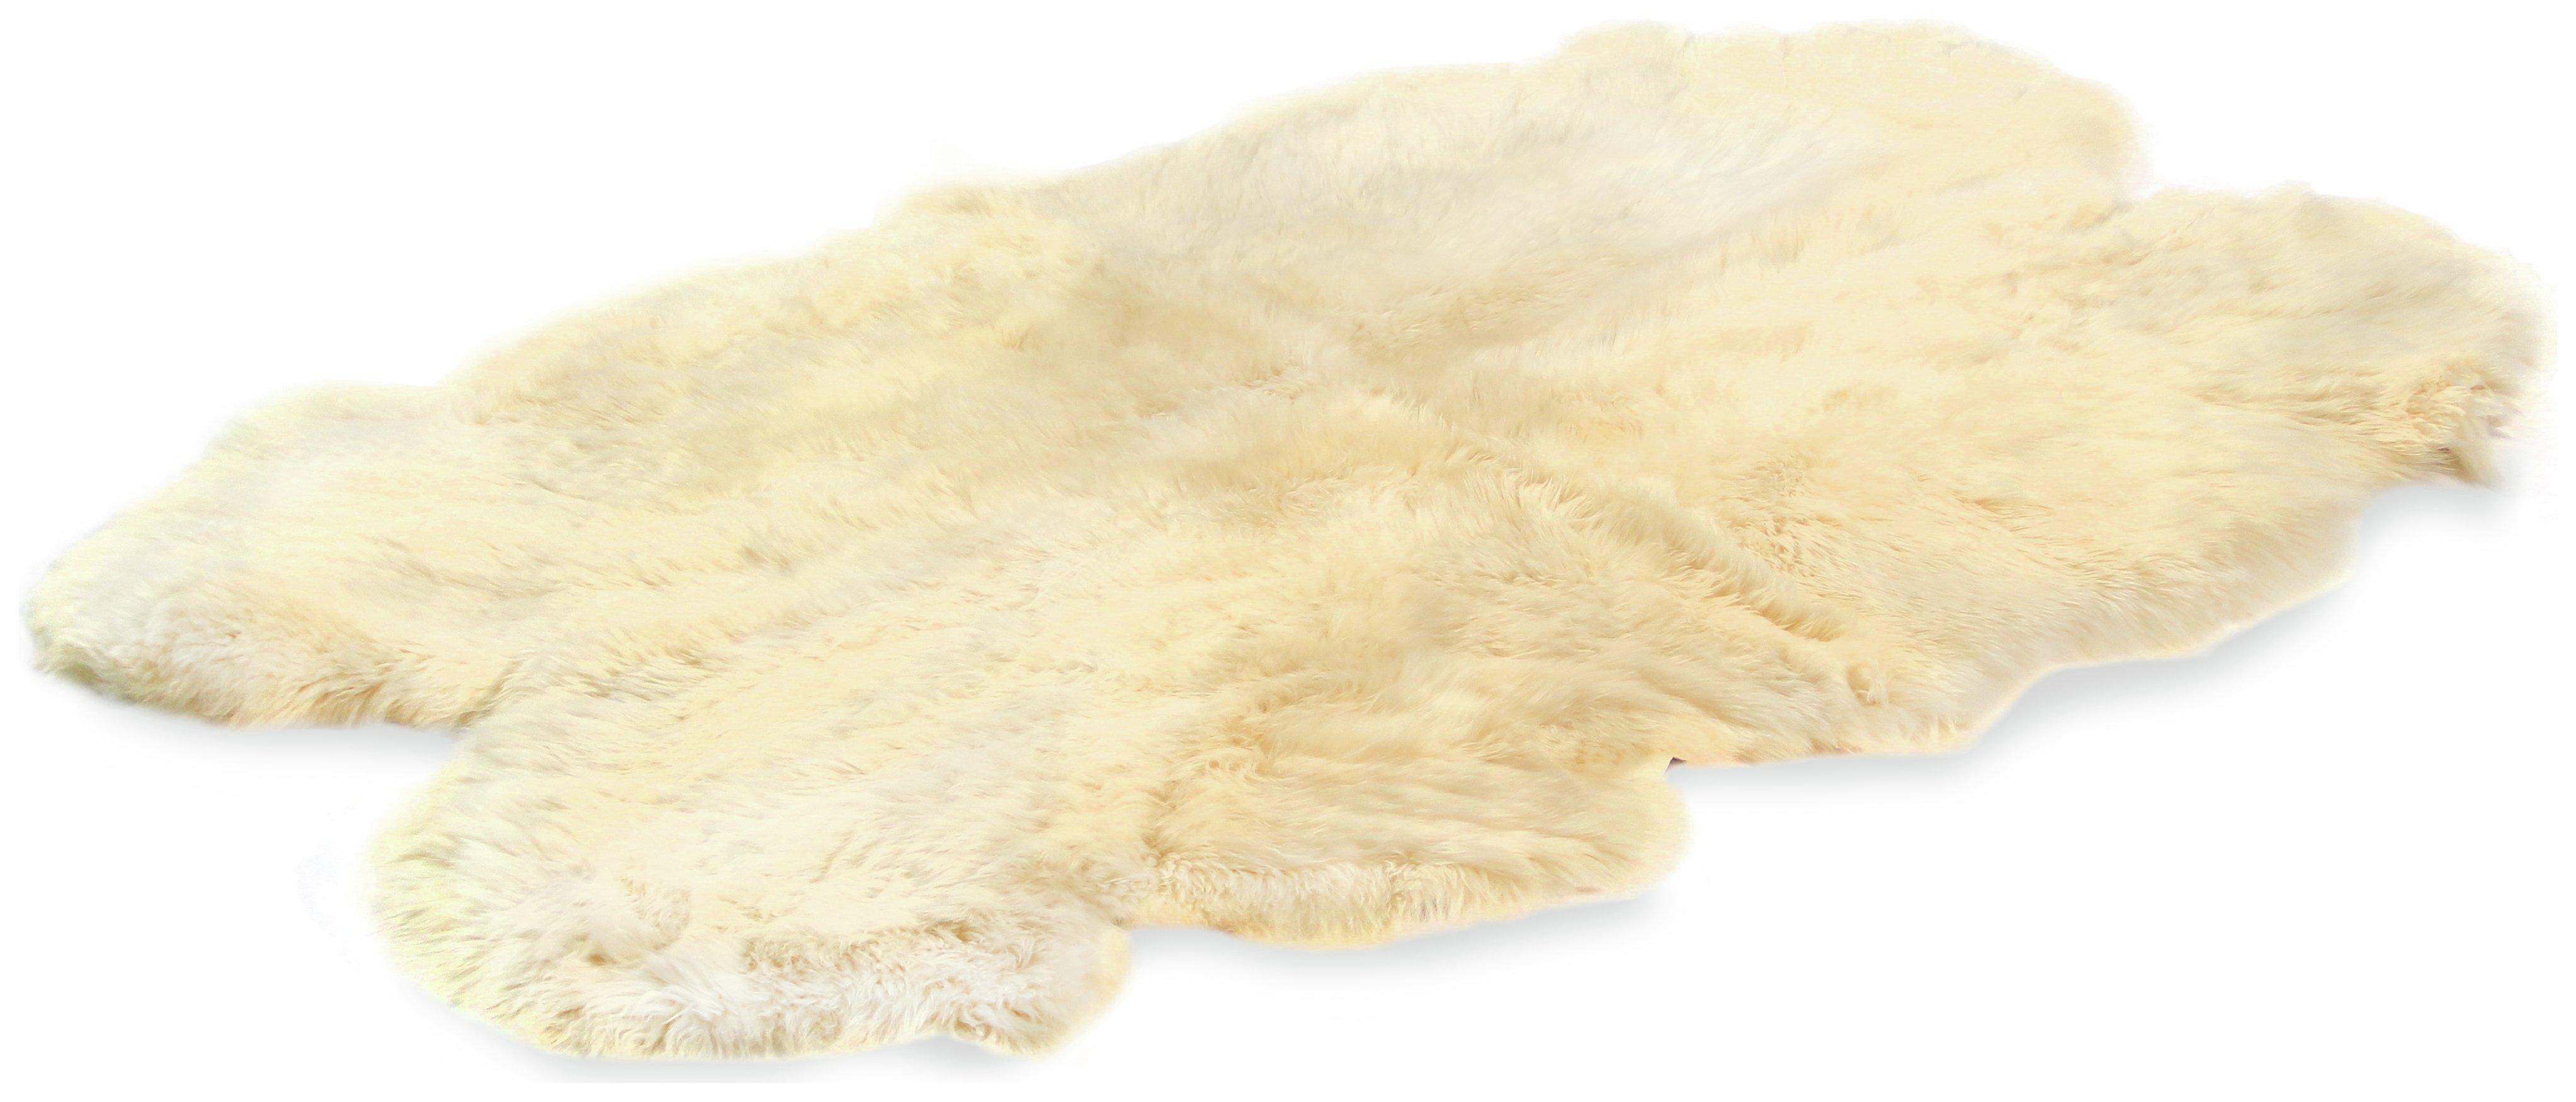 Image of Bowron Sheepskin Longwool Rug - 110x180cm - Champagne